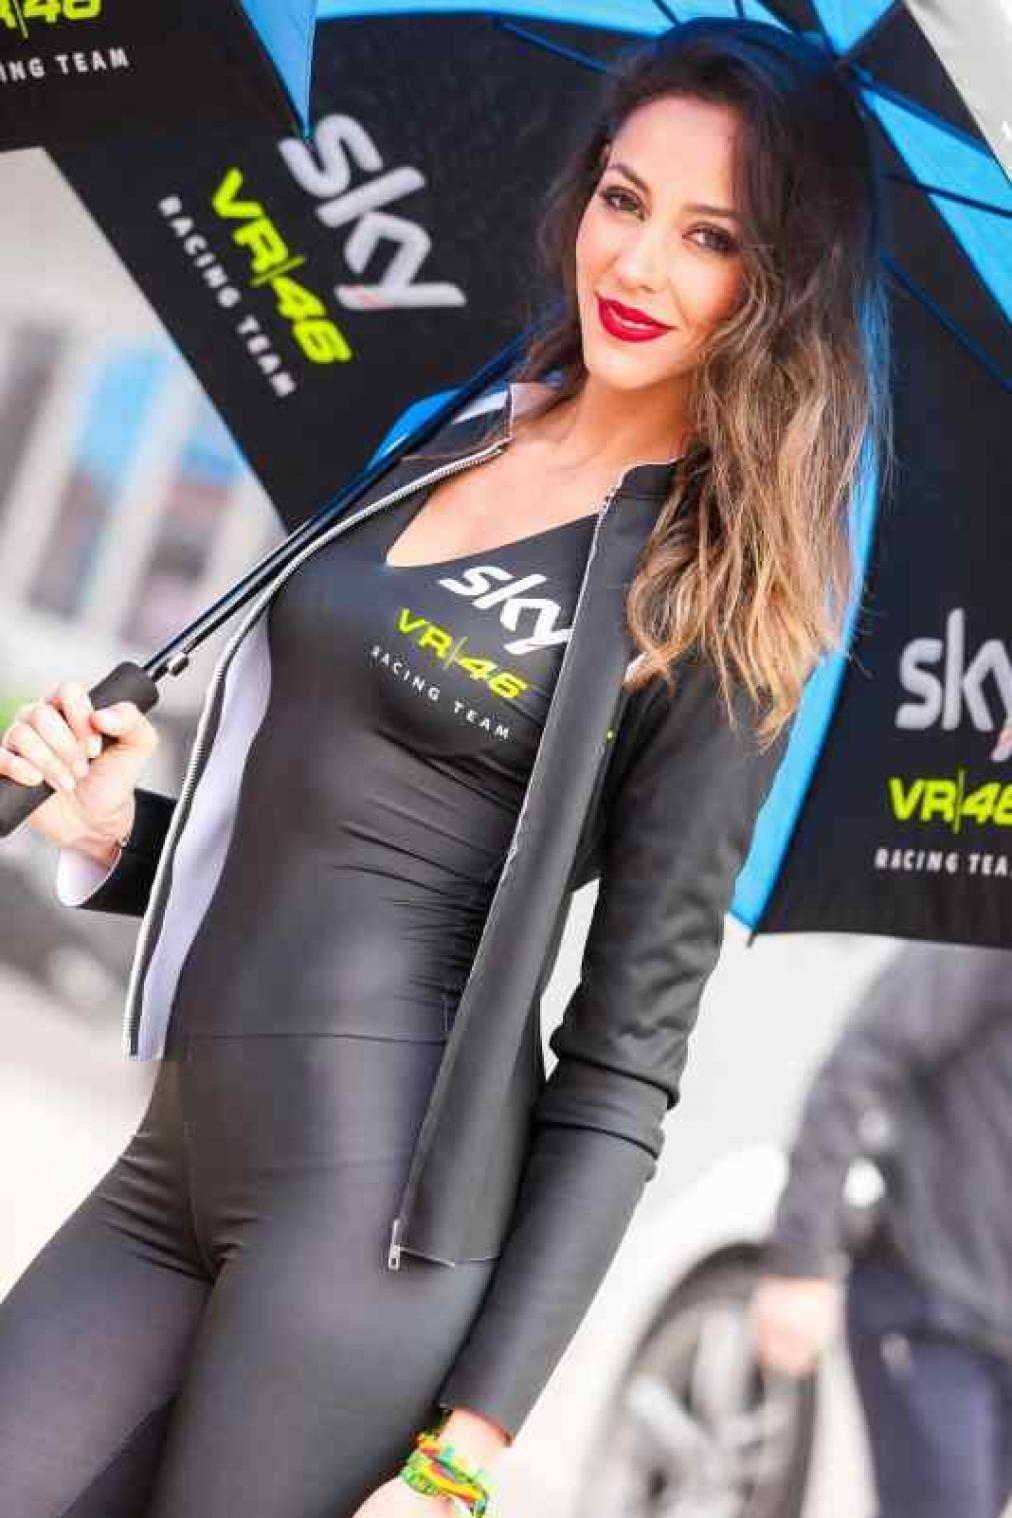 Beautiful & Hot Paddock Girls From Spain GP ! | Real Riders